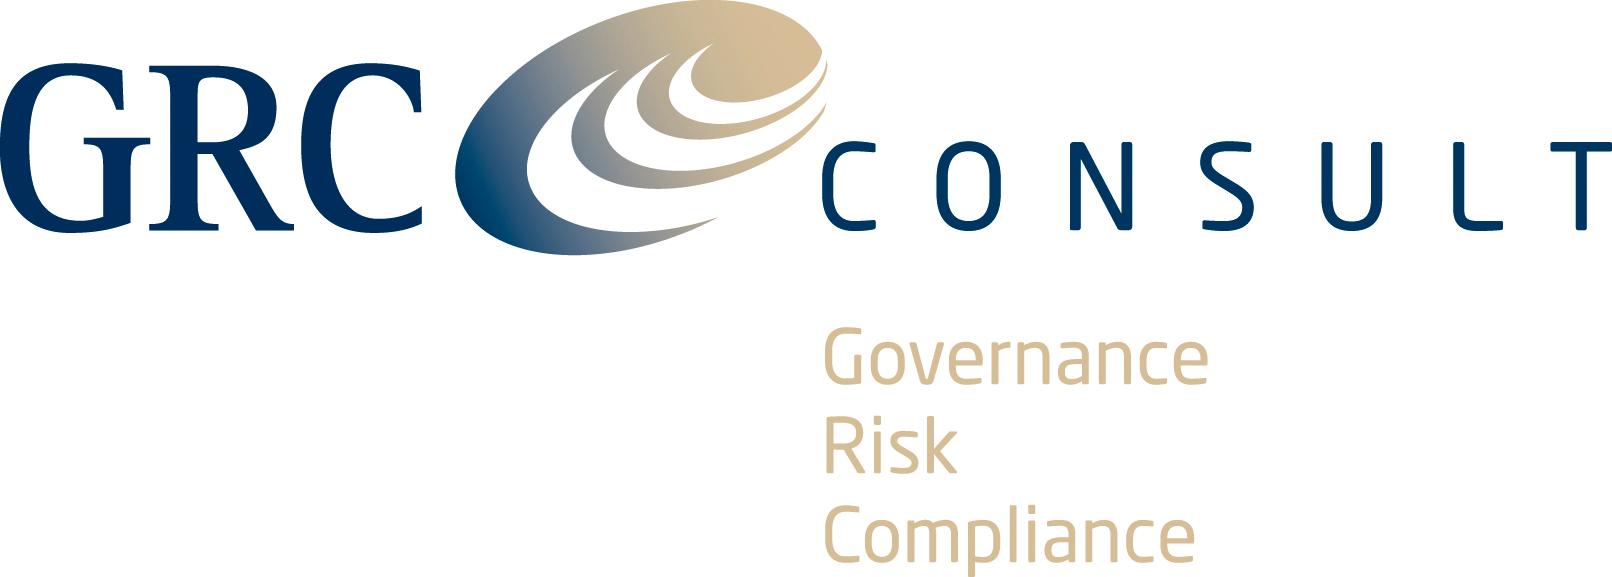 GRC Consult, Governance risk compliance logo